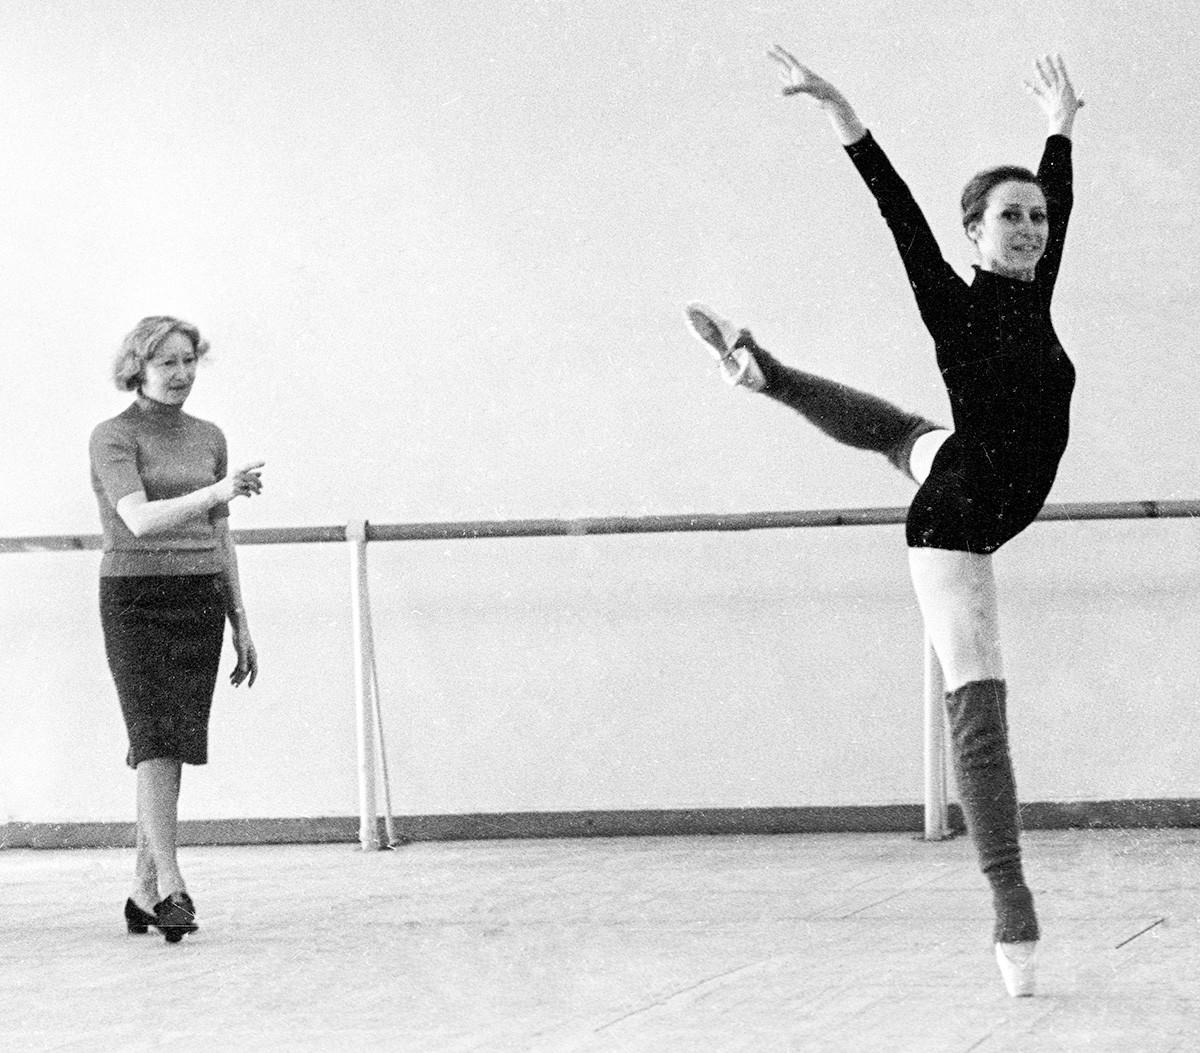 Choreography teacher Galina Ulanova (left) and dancer Maya Plisetskaya (right) rehearsing, 1969.